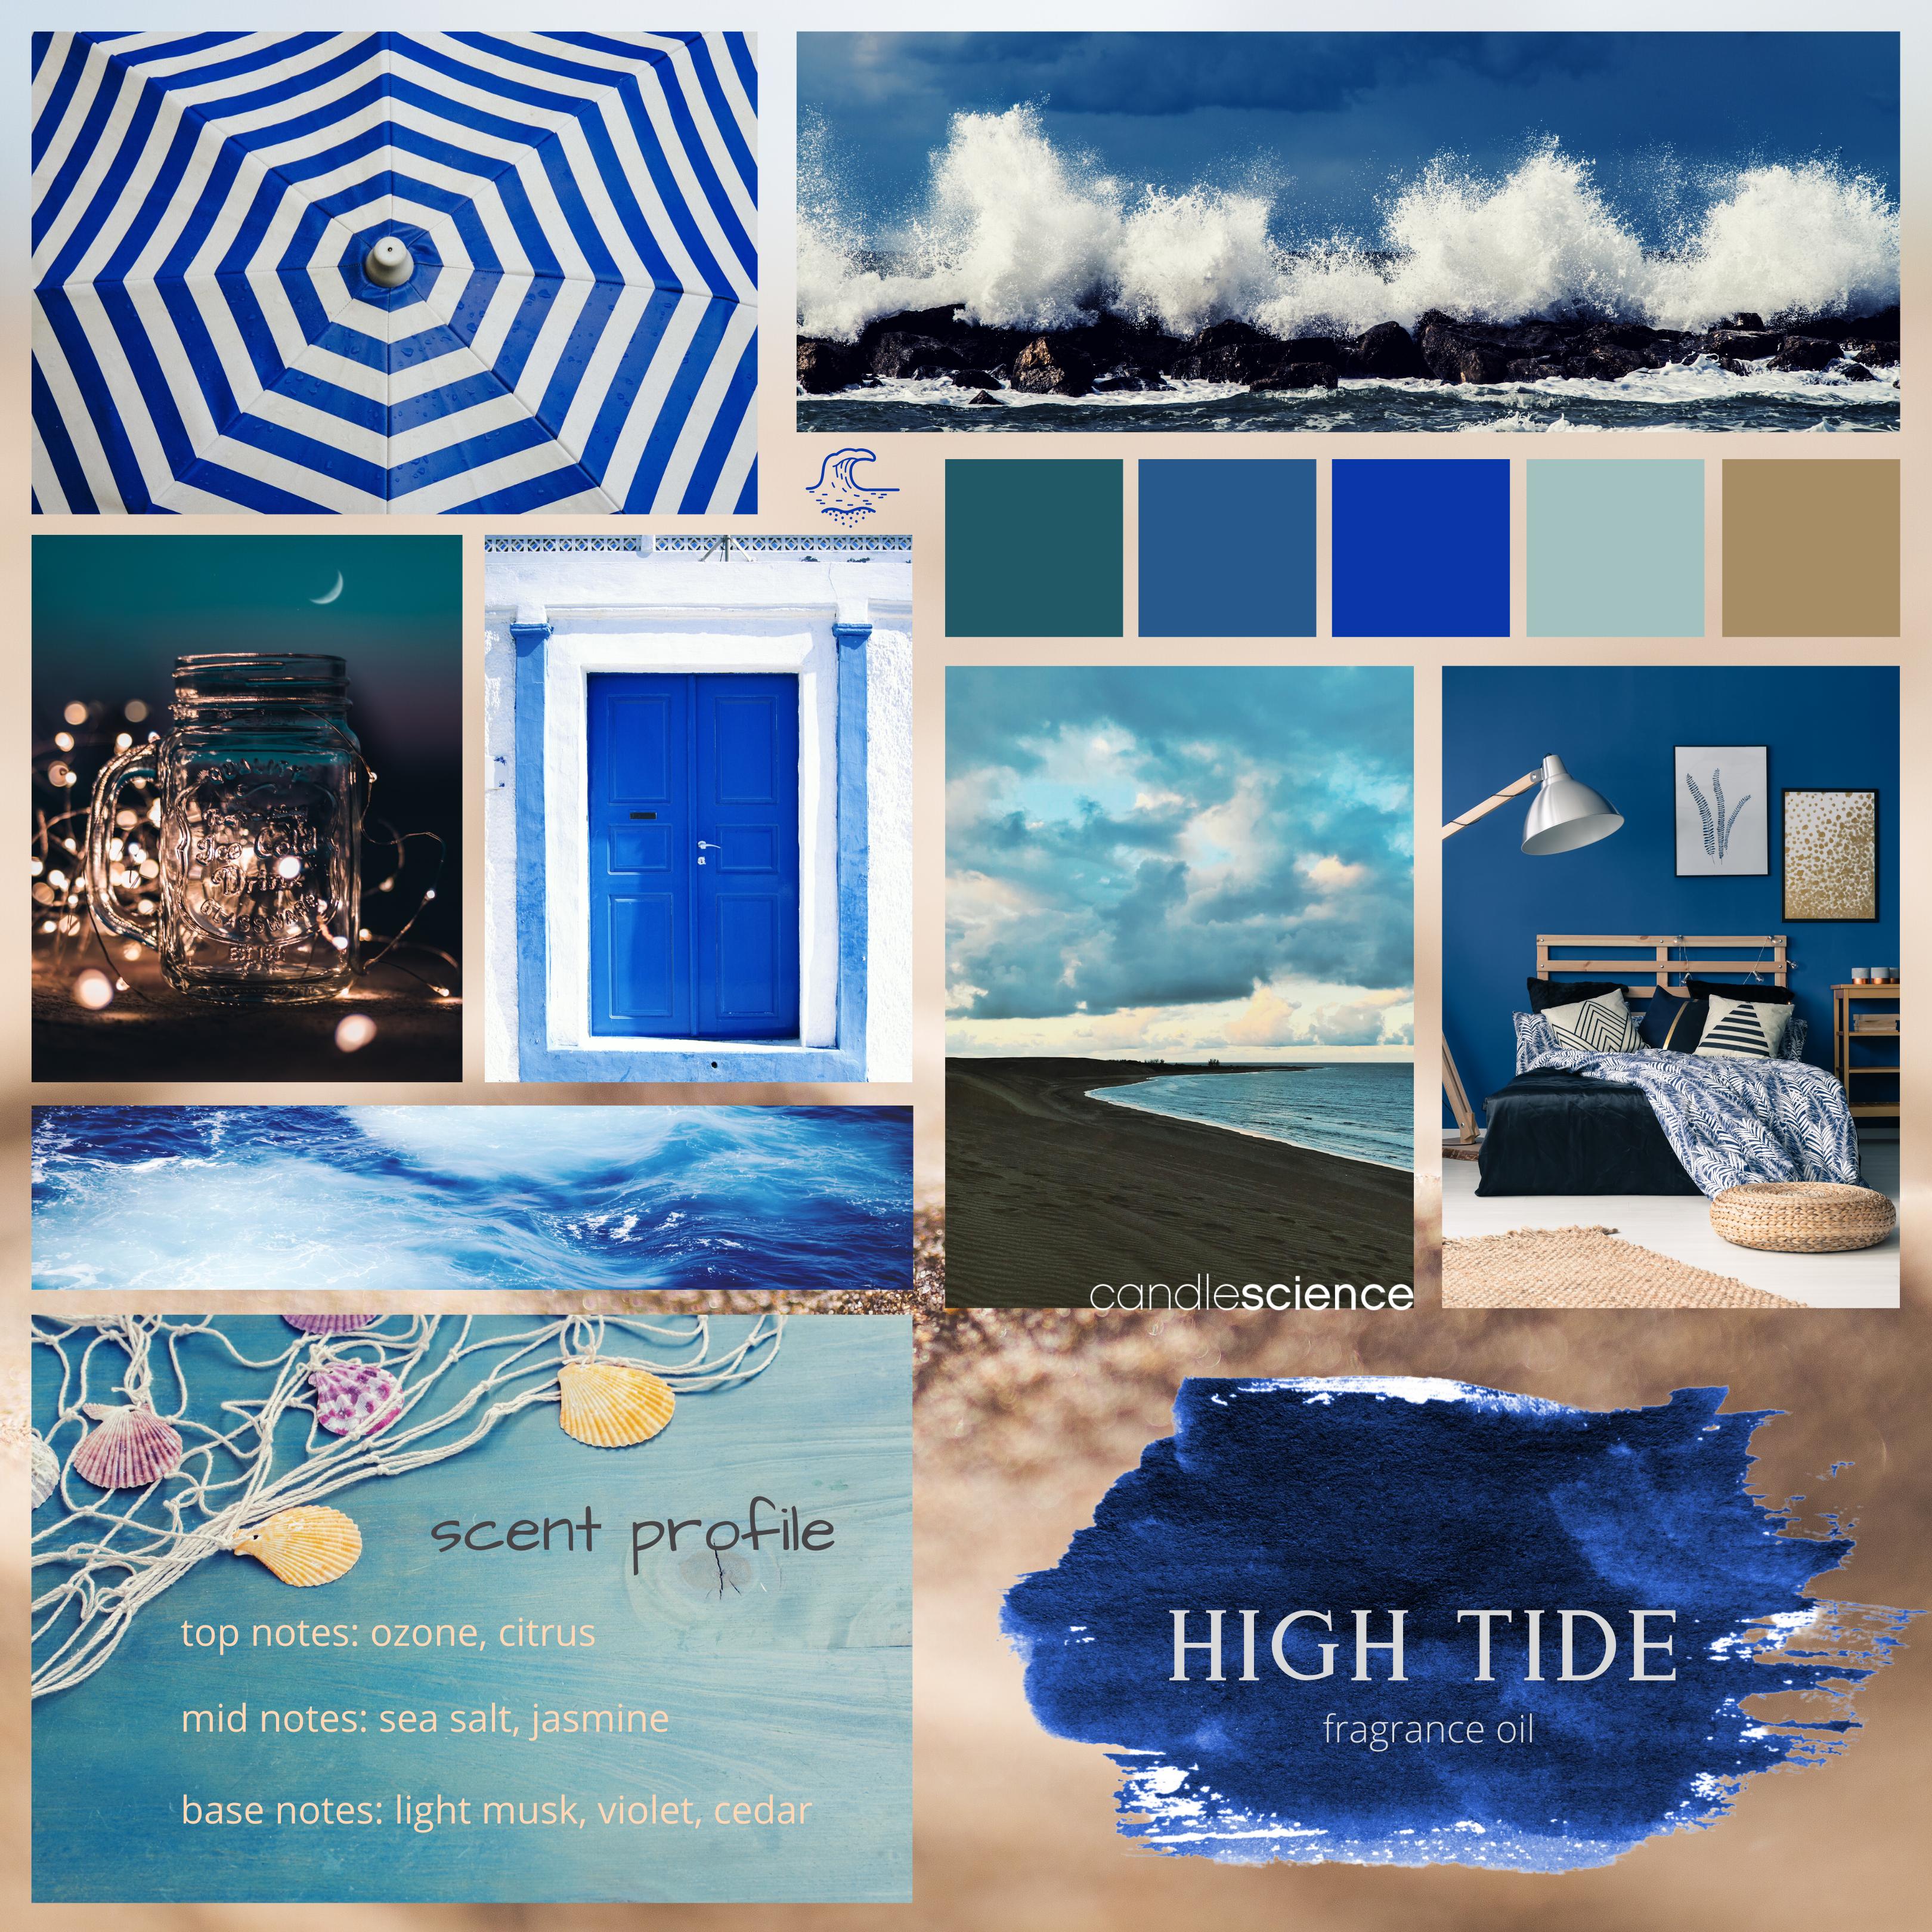 High Tide fragrance oil mood board